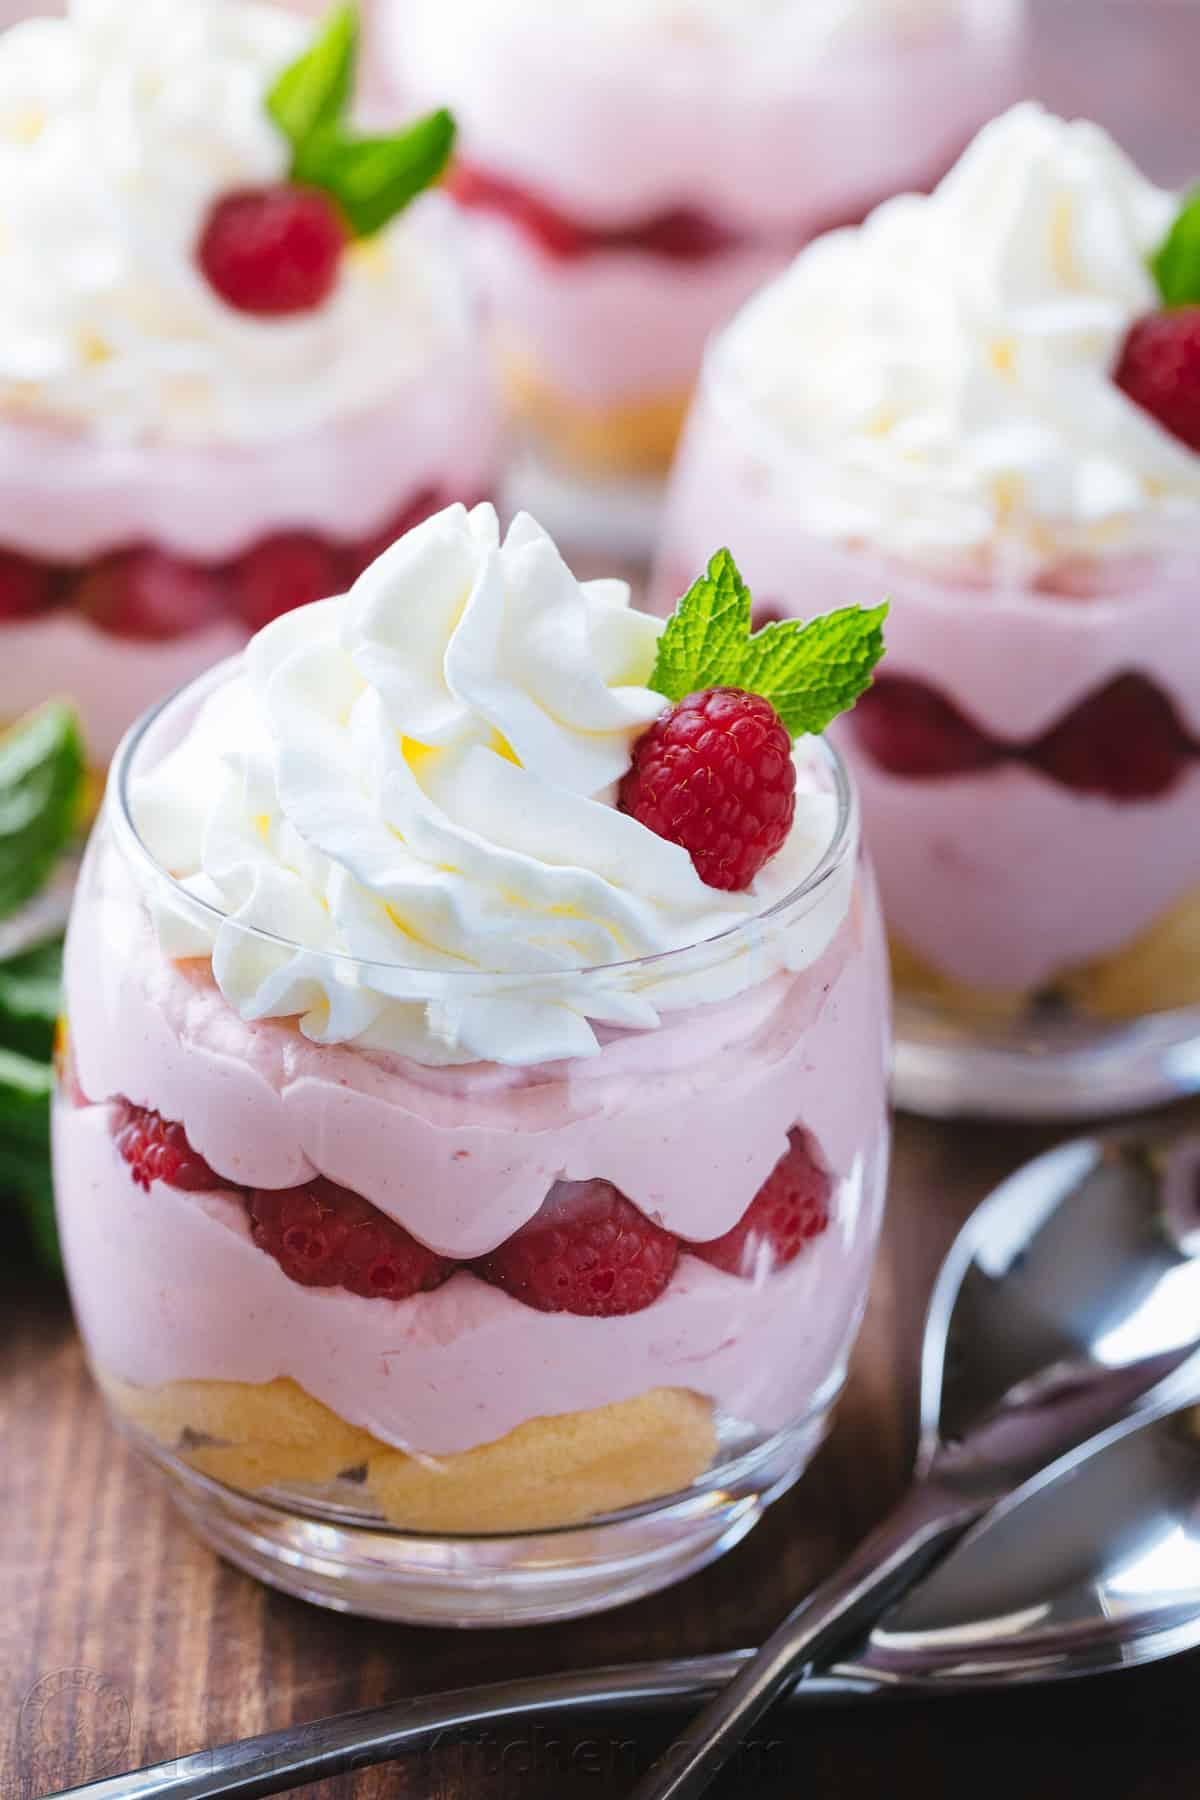 Easy Dessert Recipes Raspberry Mousse Cups Video Recipe Natashaskitchen Com